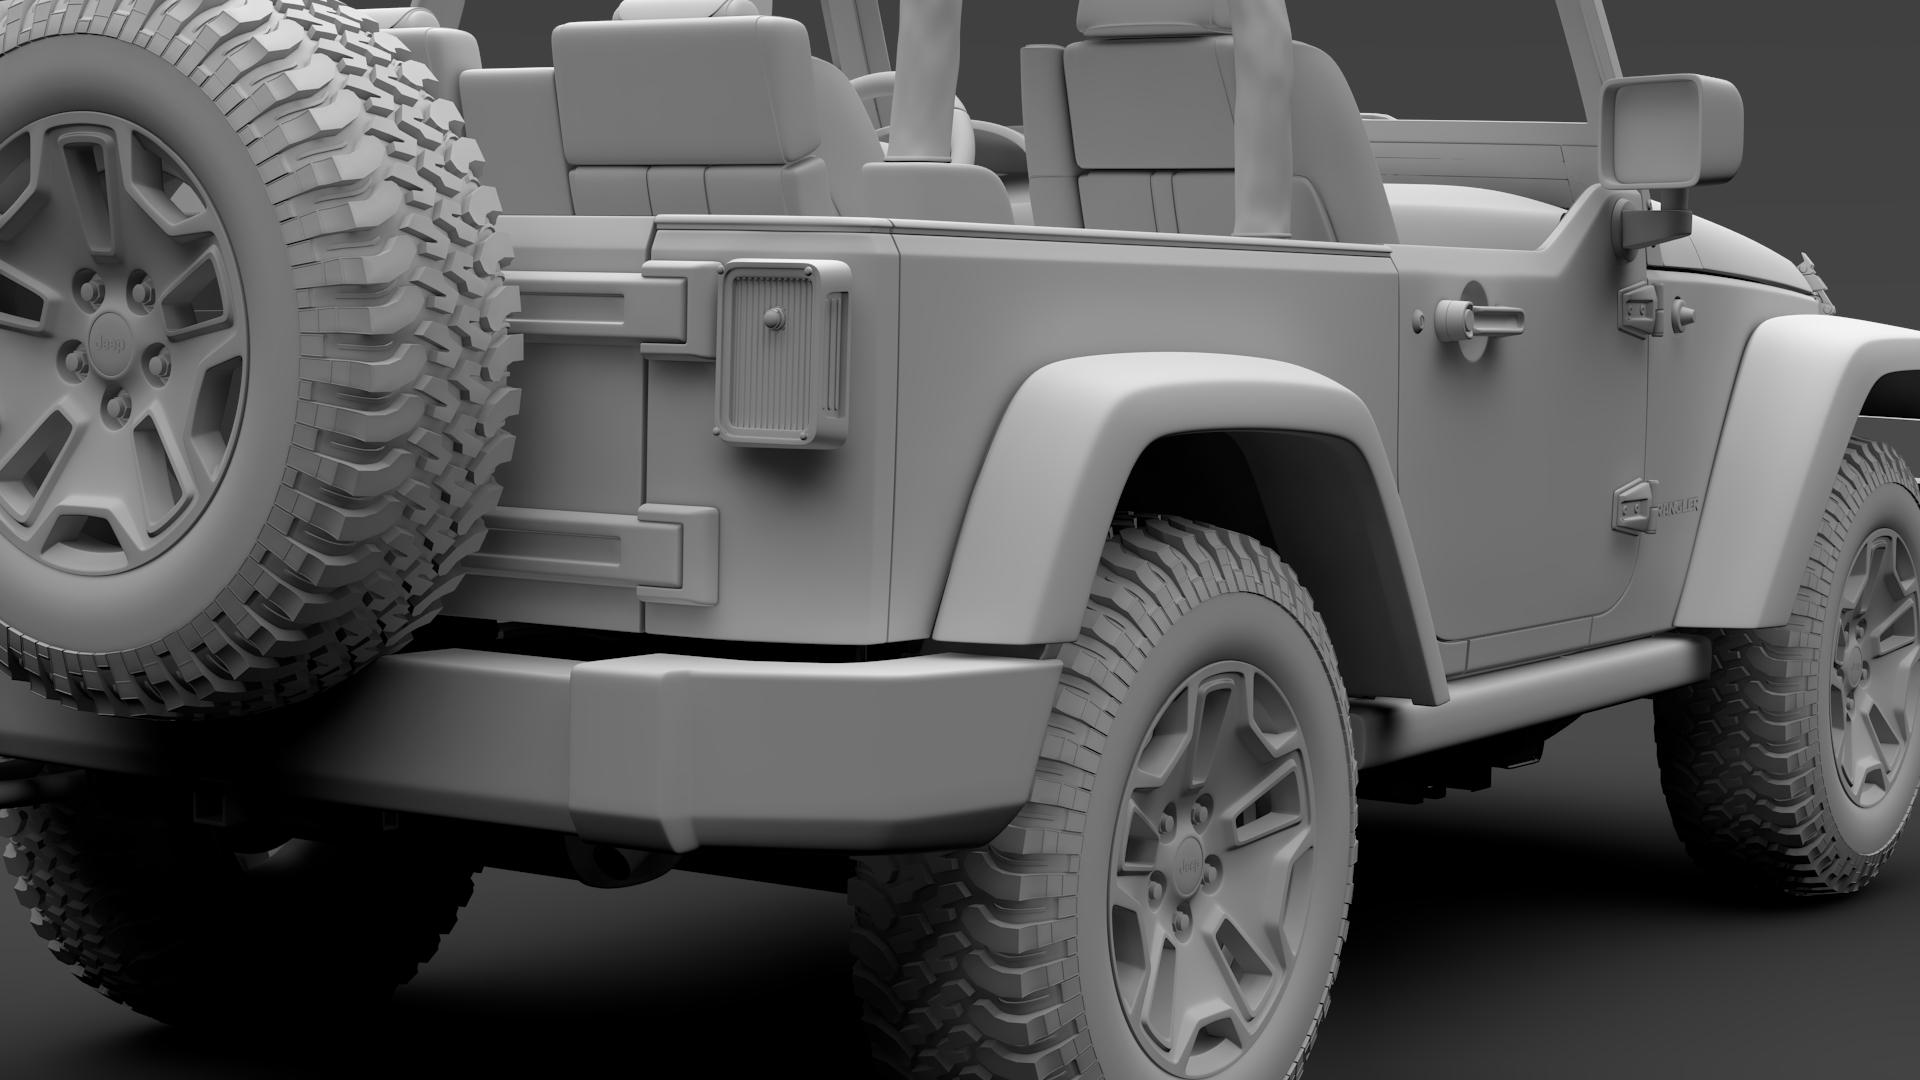 jeep wrangler willys wheeler jk 2017 3d model max fbx c4d lwo ma mb hrc xsi obj 276809